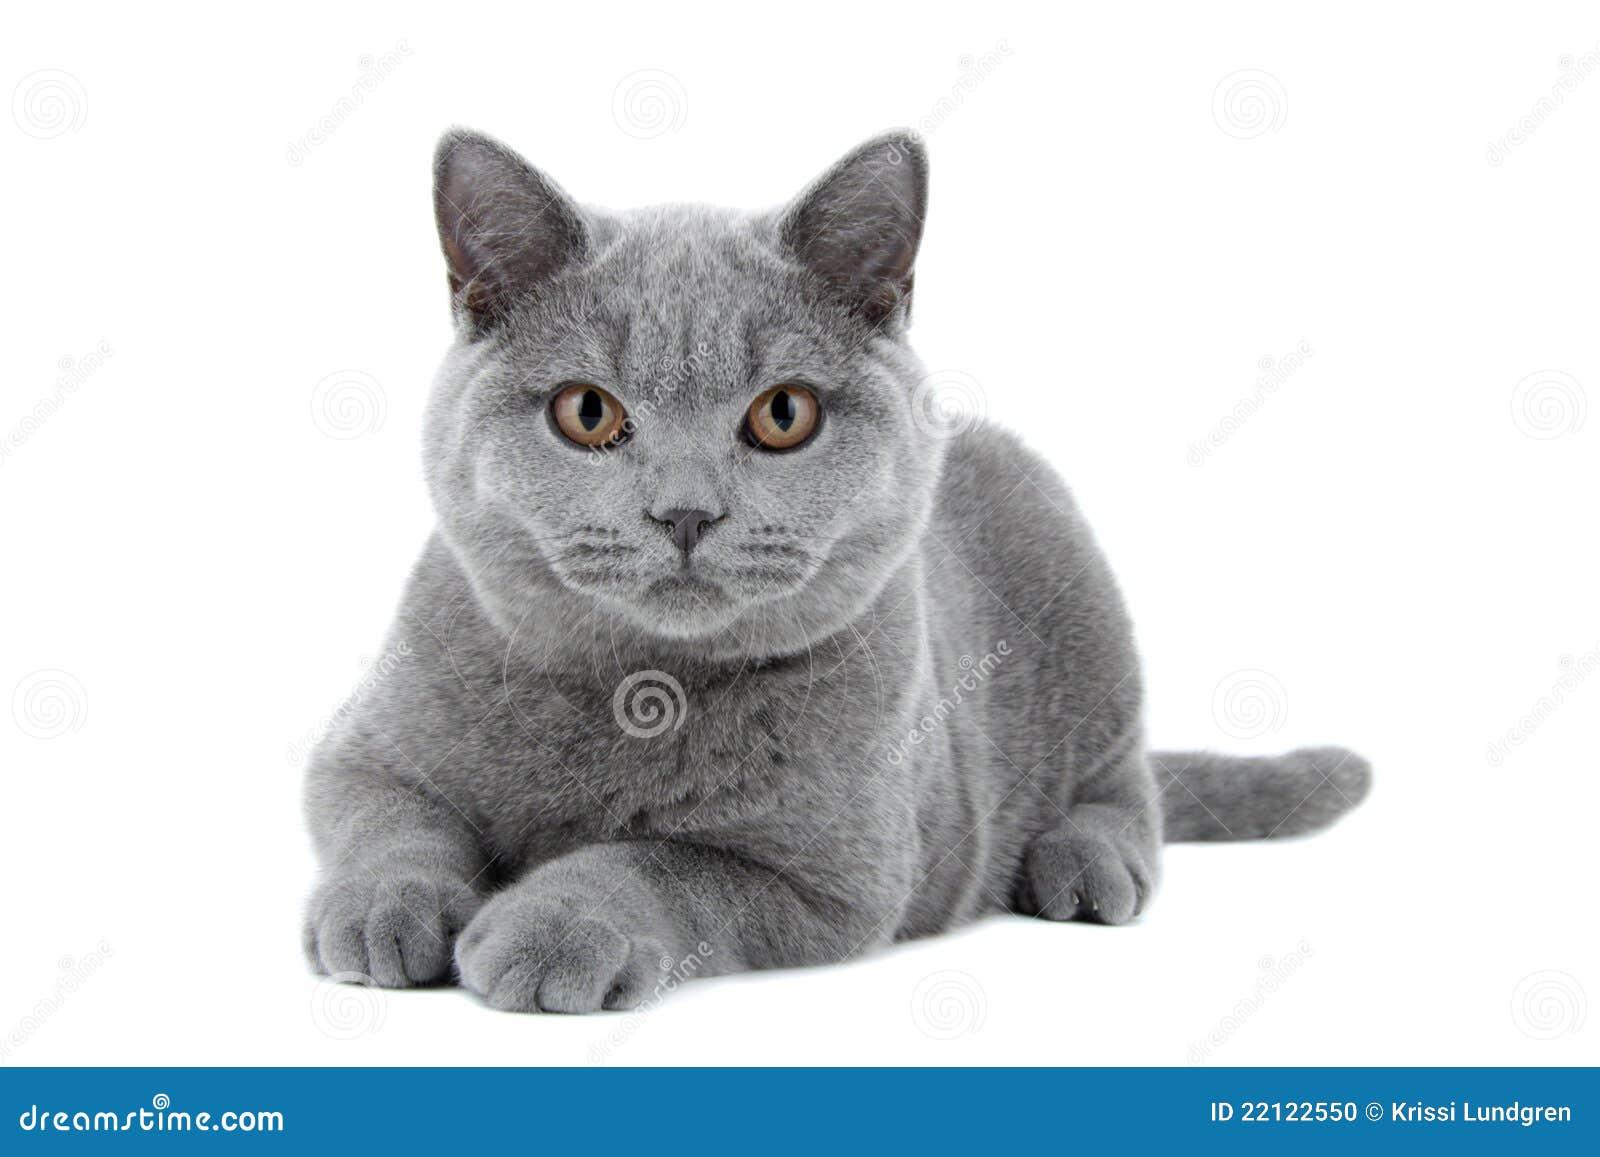 Blue British Shorthair Cat Stock Image